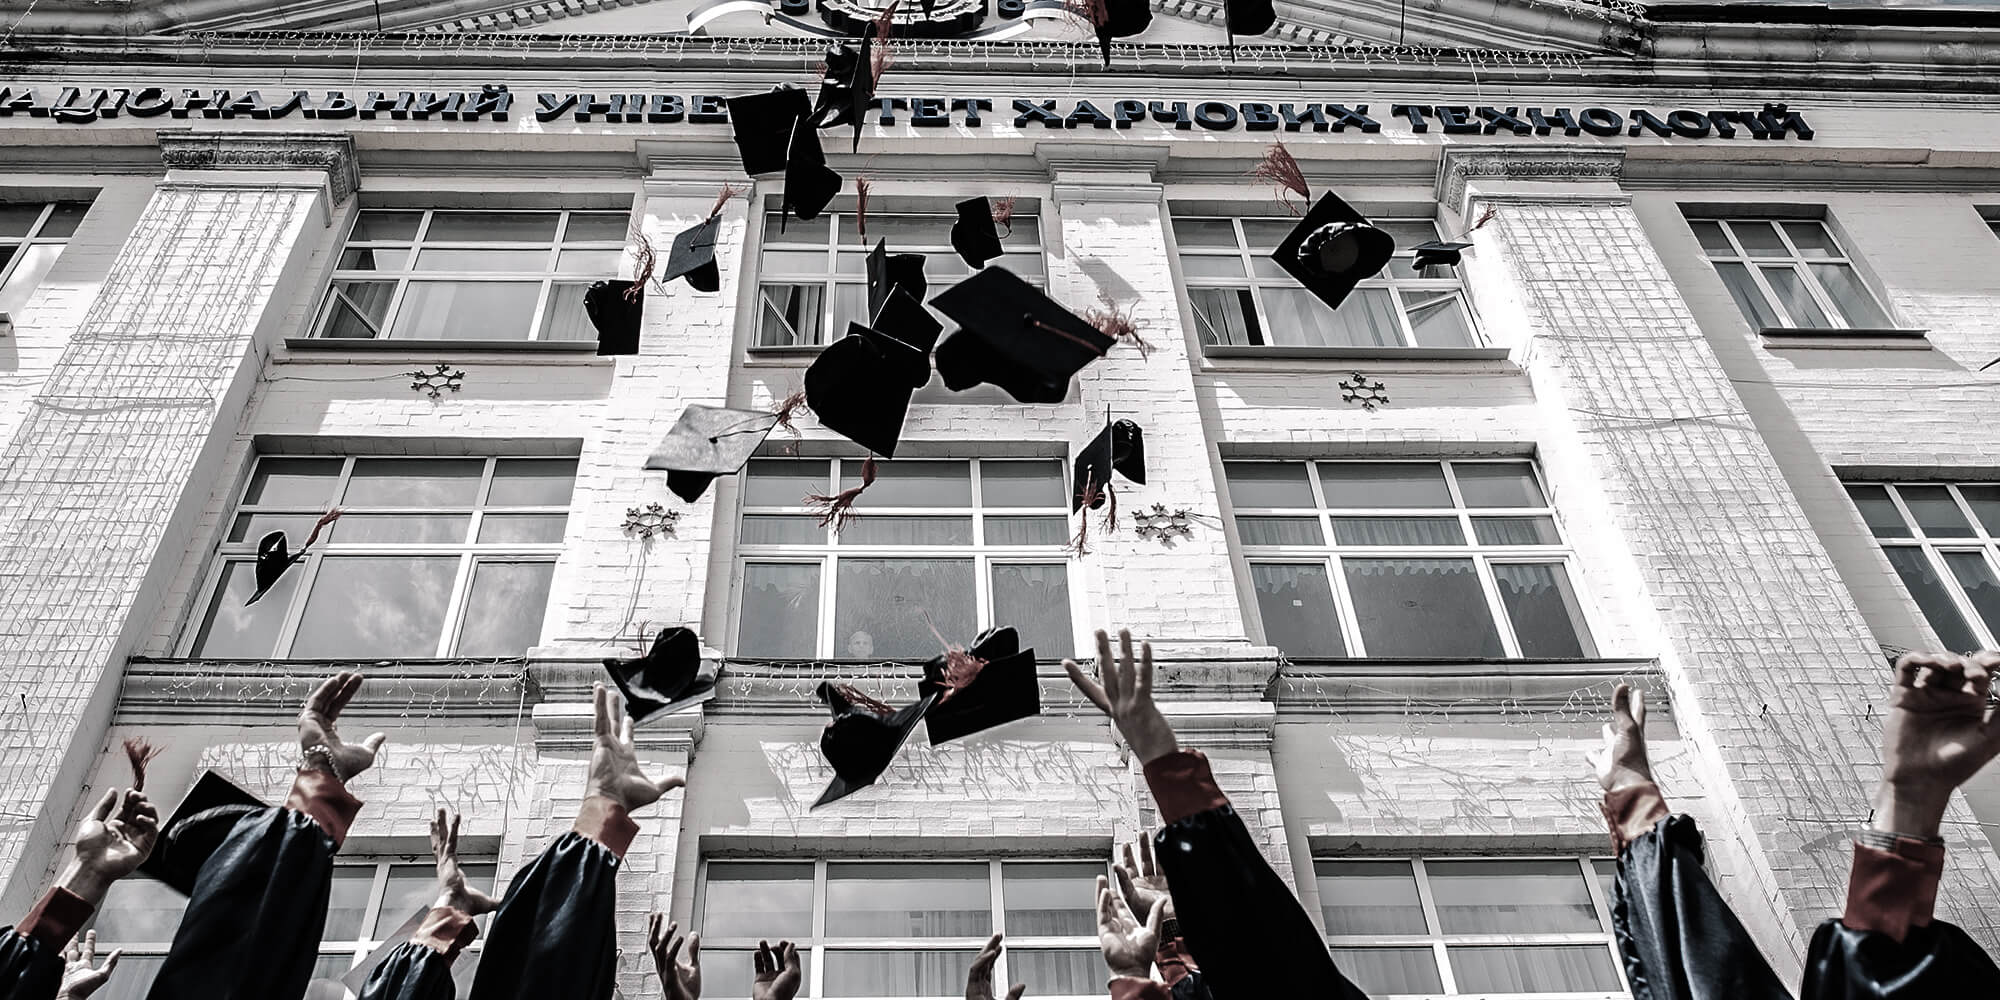 when you graduate